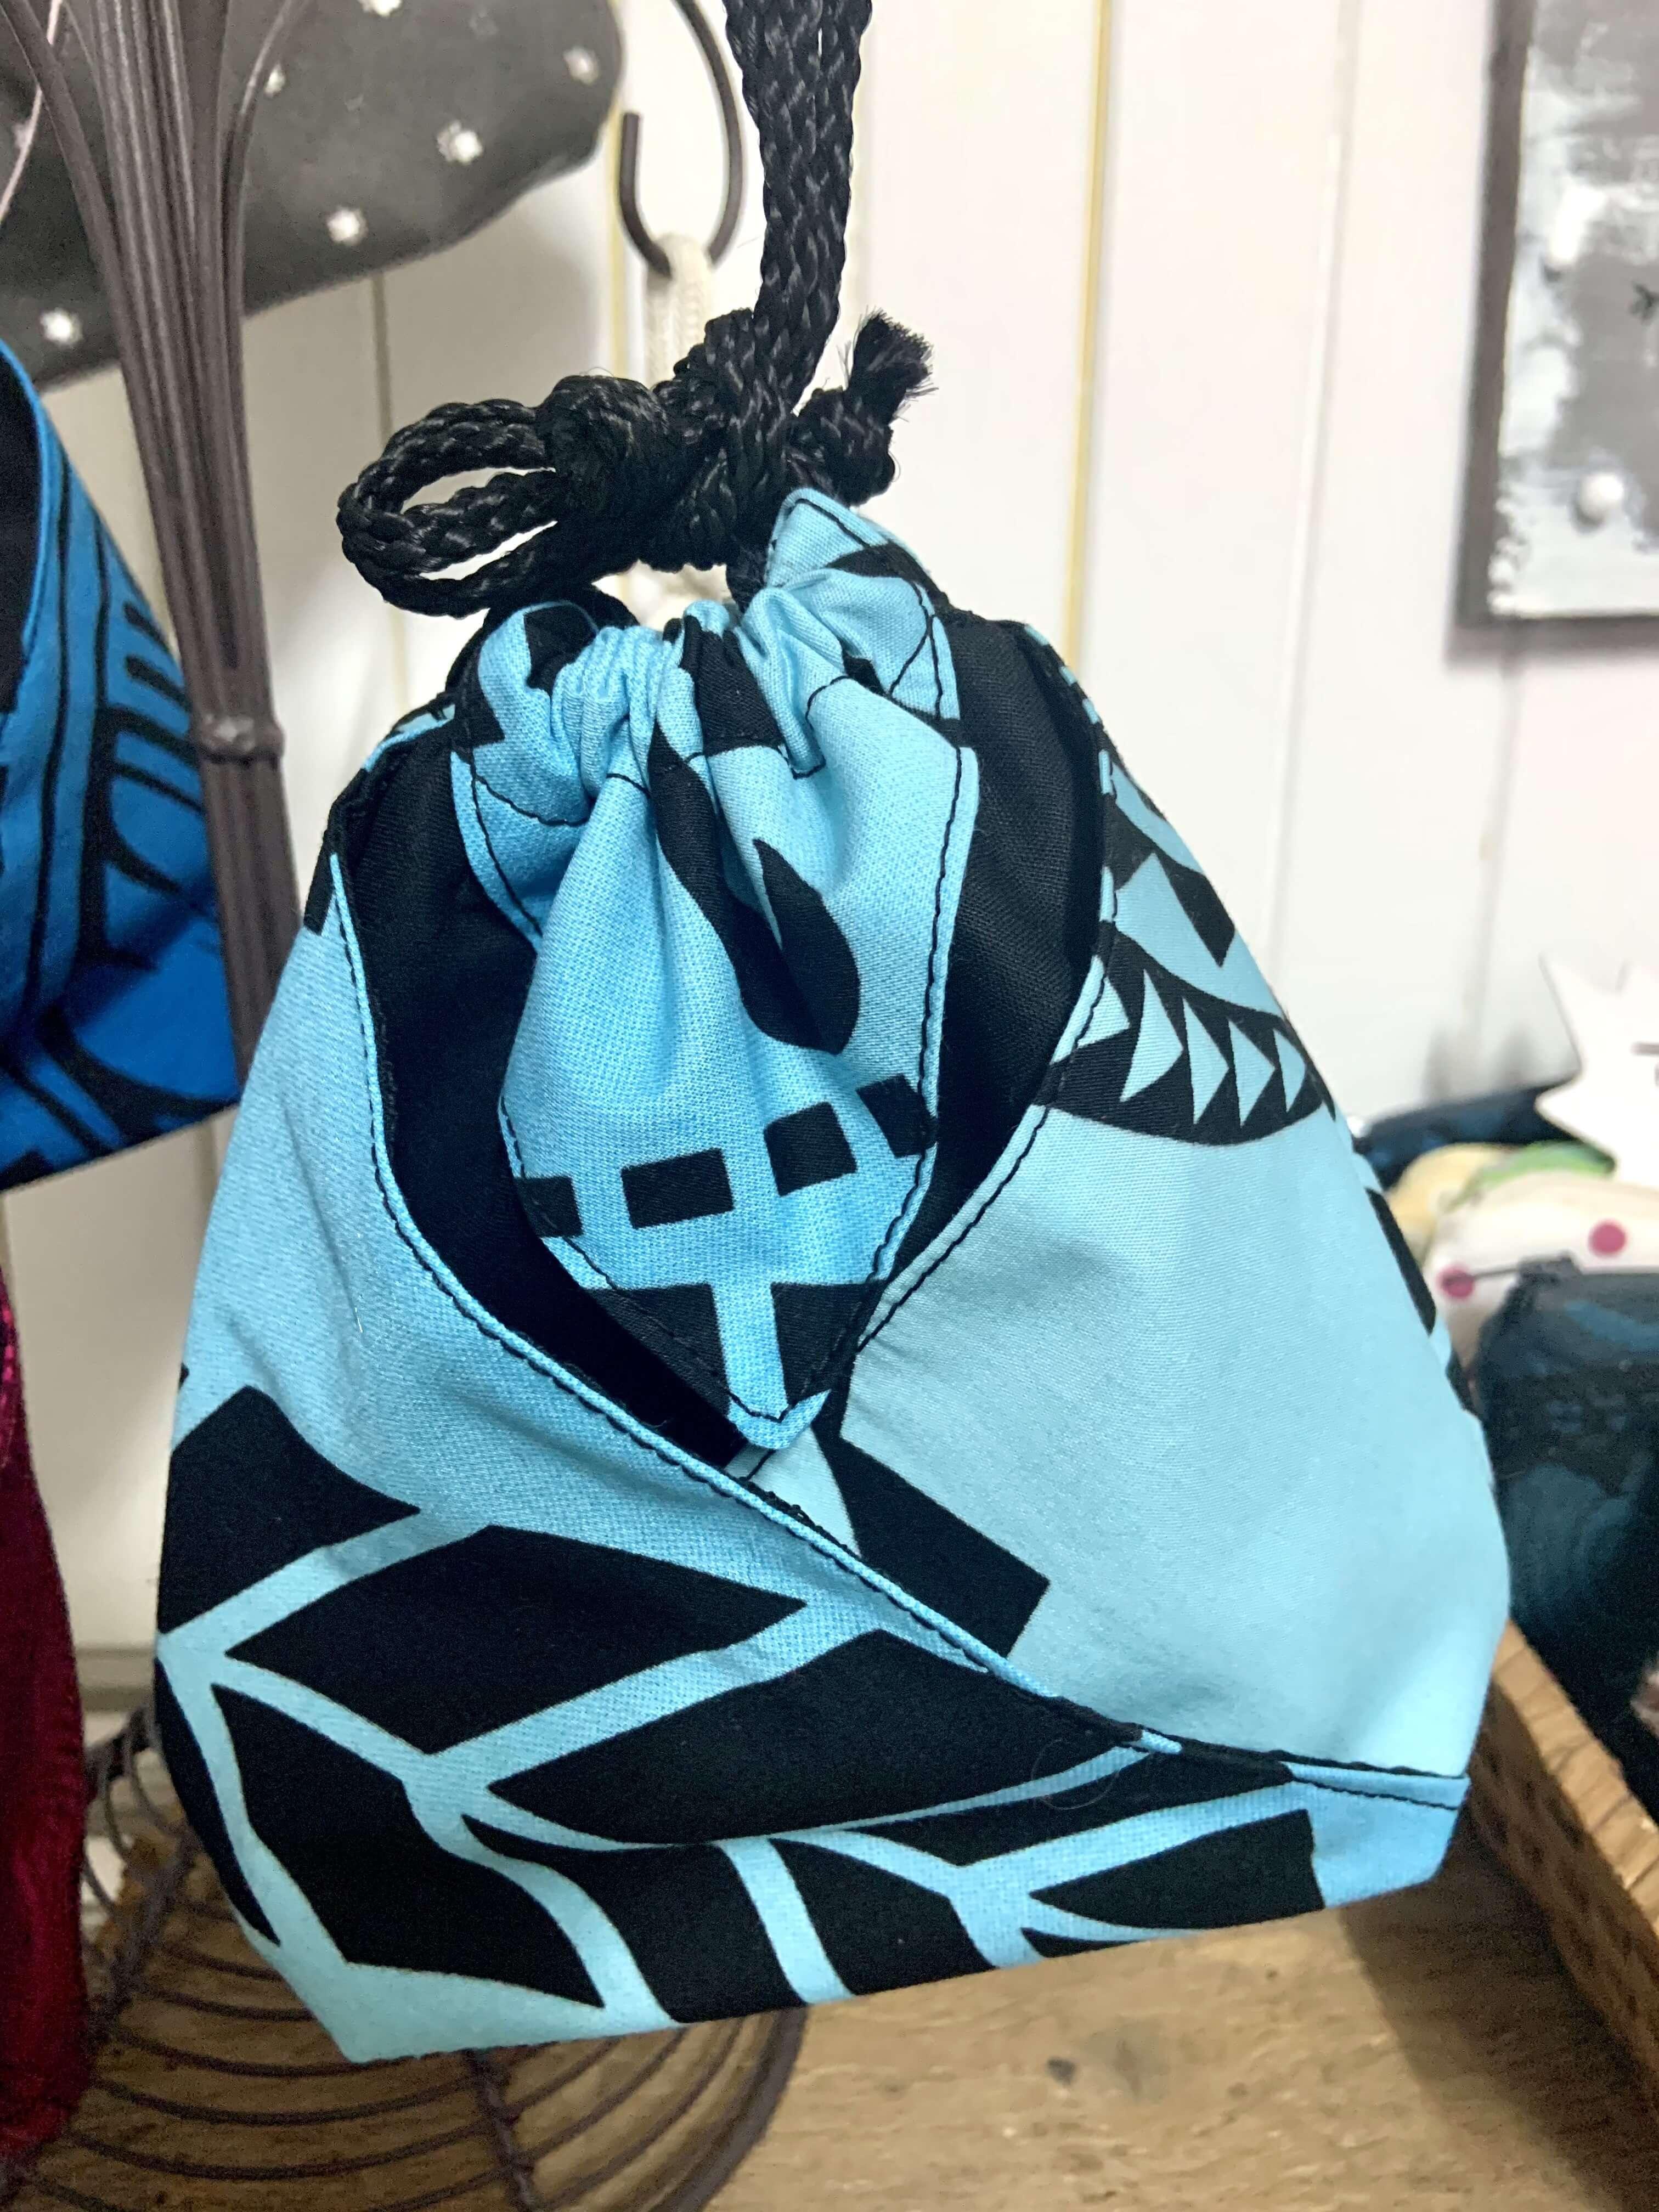 Bourse origami bleue